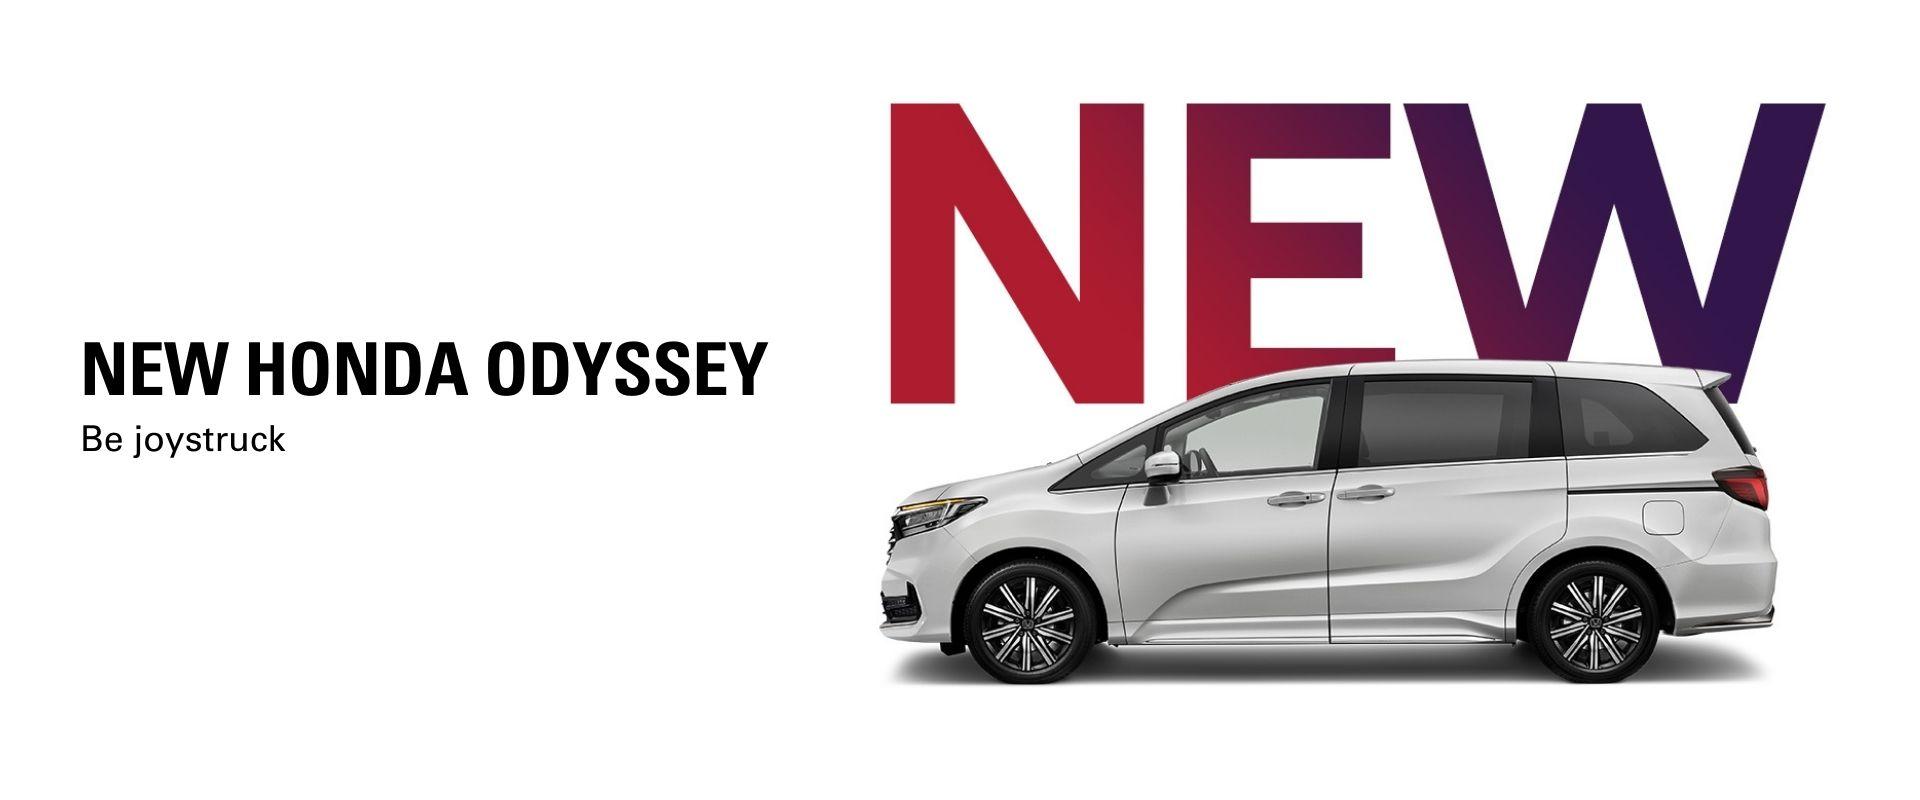 New Honda Odyssey. Be joystruck.